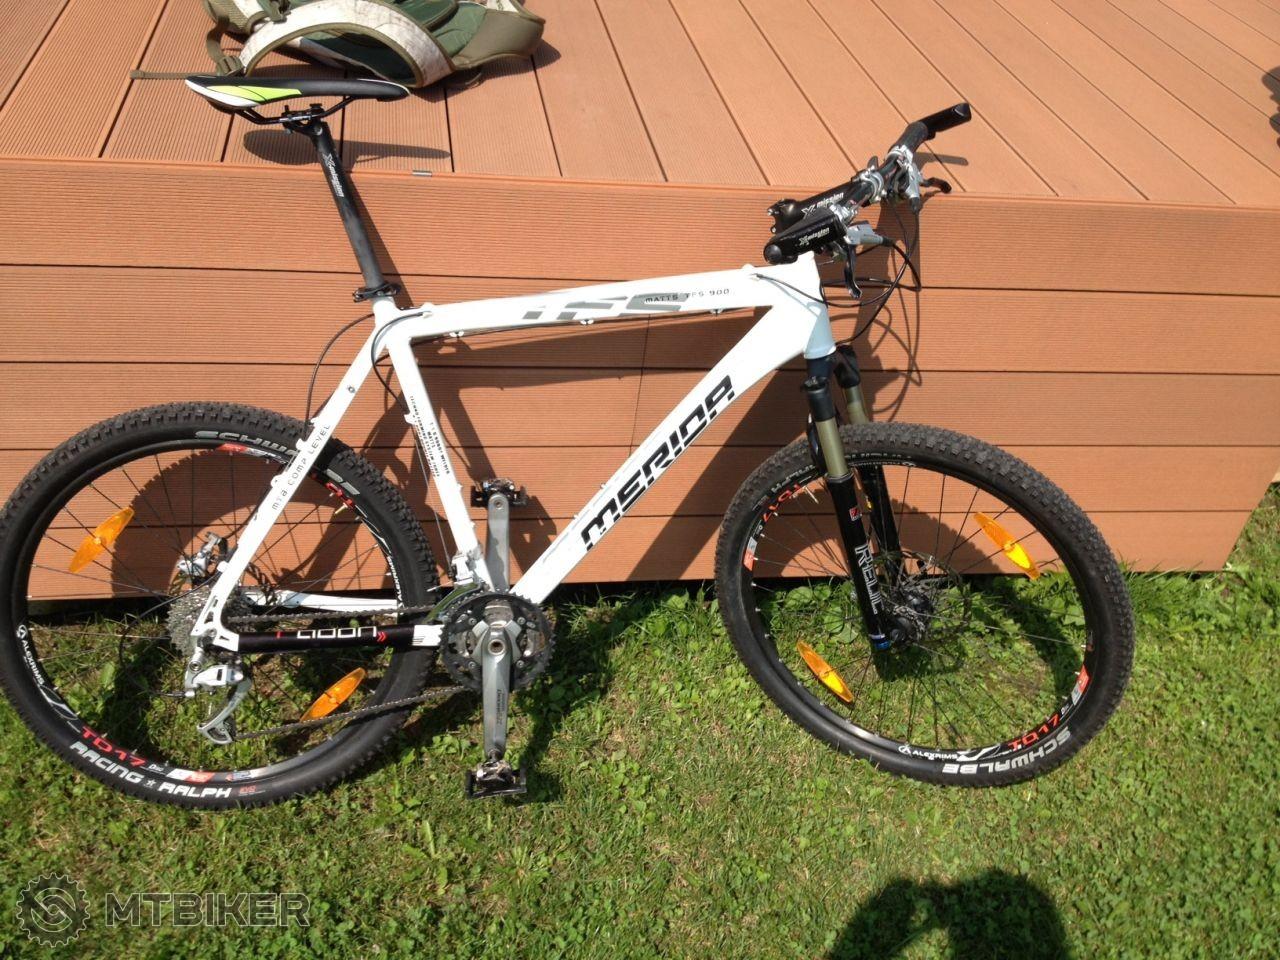 bf5a3b5121ca Predám Horský Bicykel Merida Matts Tfs 900 - Bicykle - Pevné a hardtail -  Bazár MTBIKER